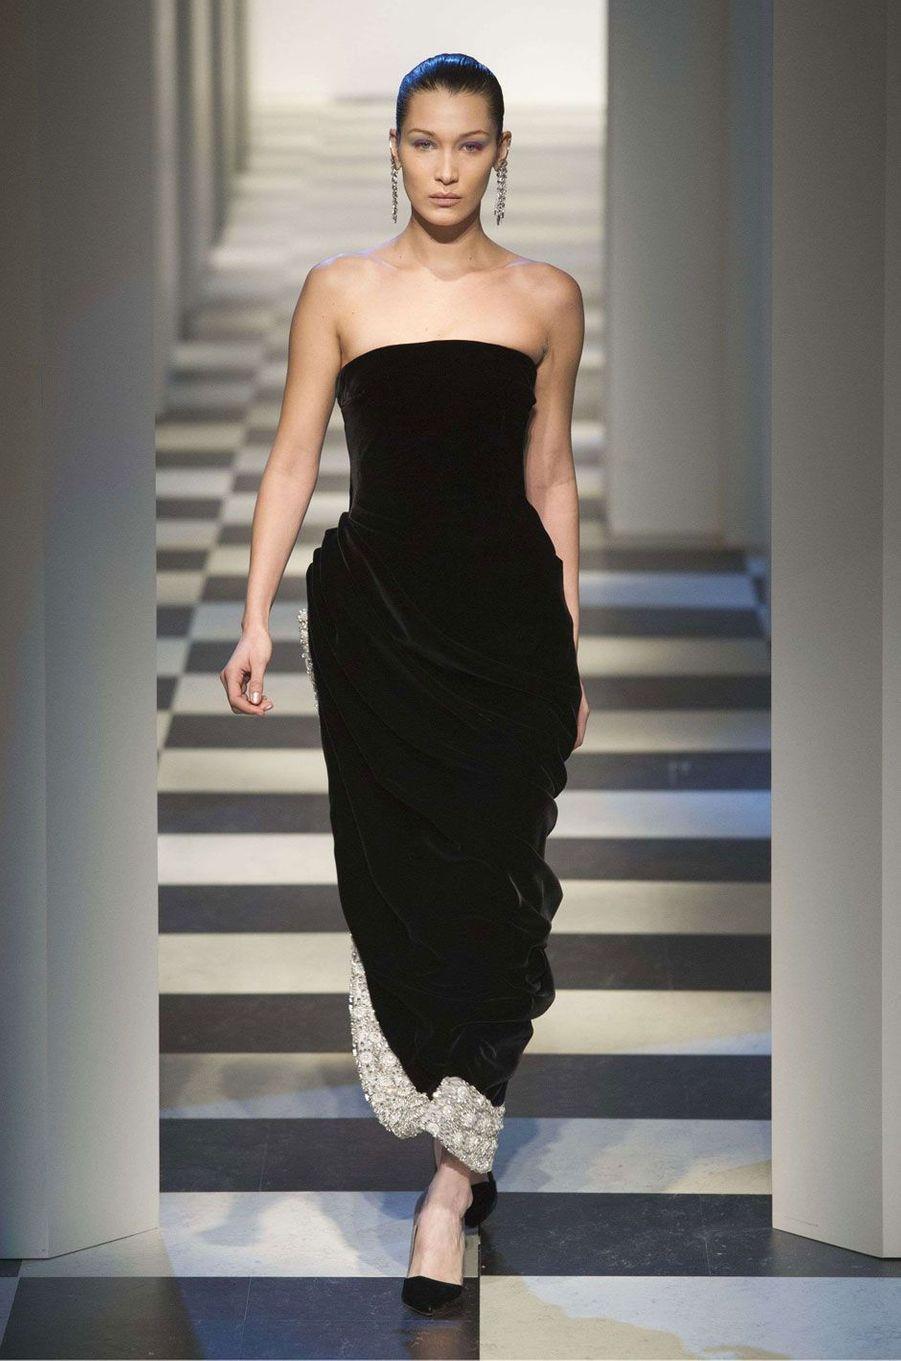 Bella Hadid au défilé Oscar de la Renta à New York.